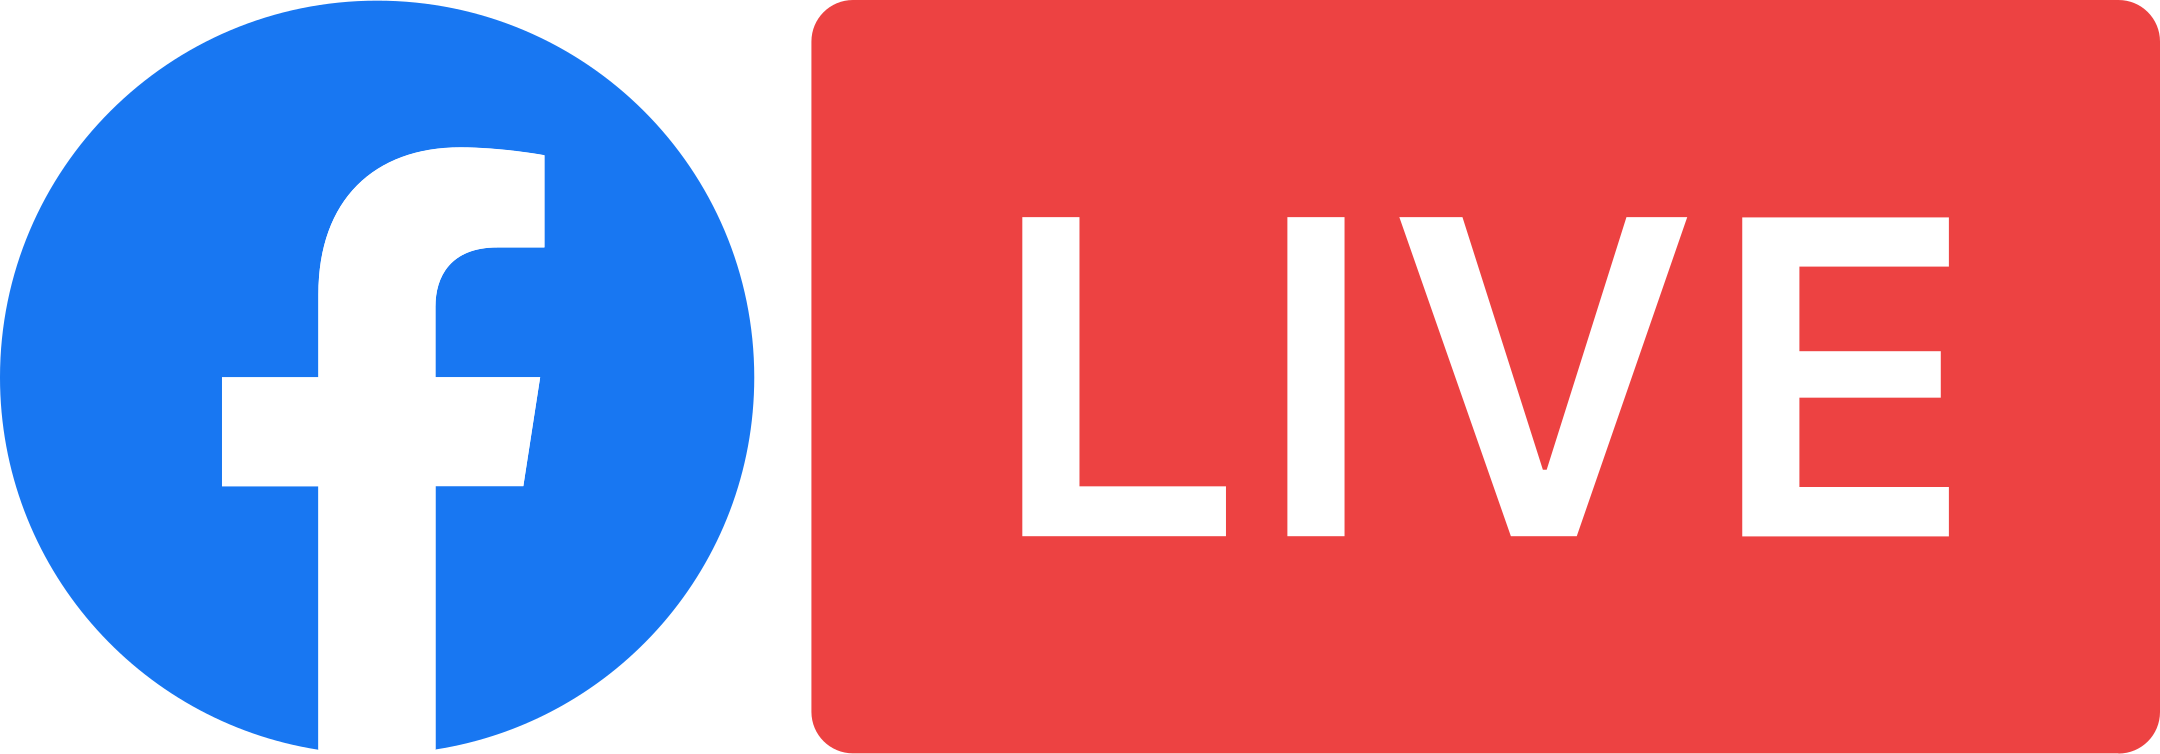 Resultado De Imagenes De Google Para Https Logodownload Org Wp Content Uploads 2020 04 F Lead Generation Real Estate Network Marketing Business Facebook Live